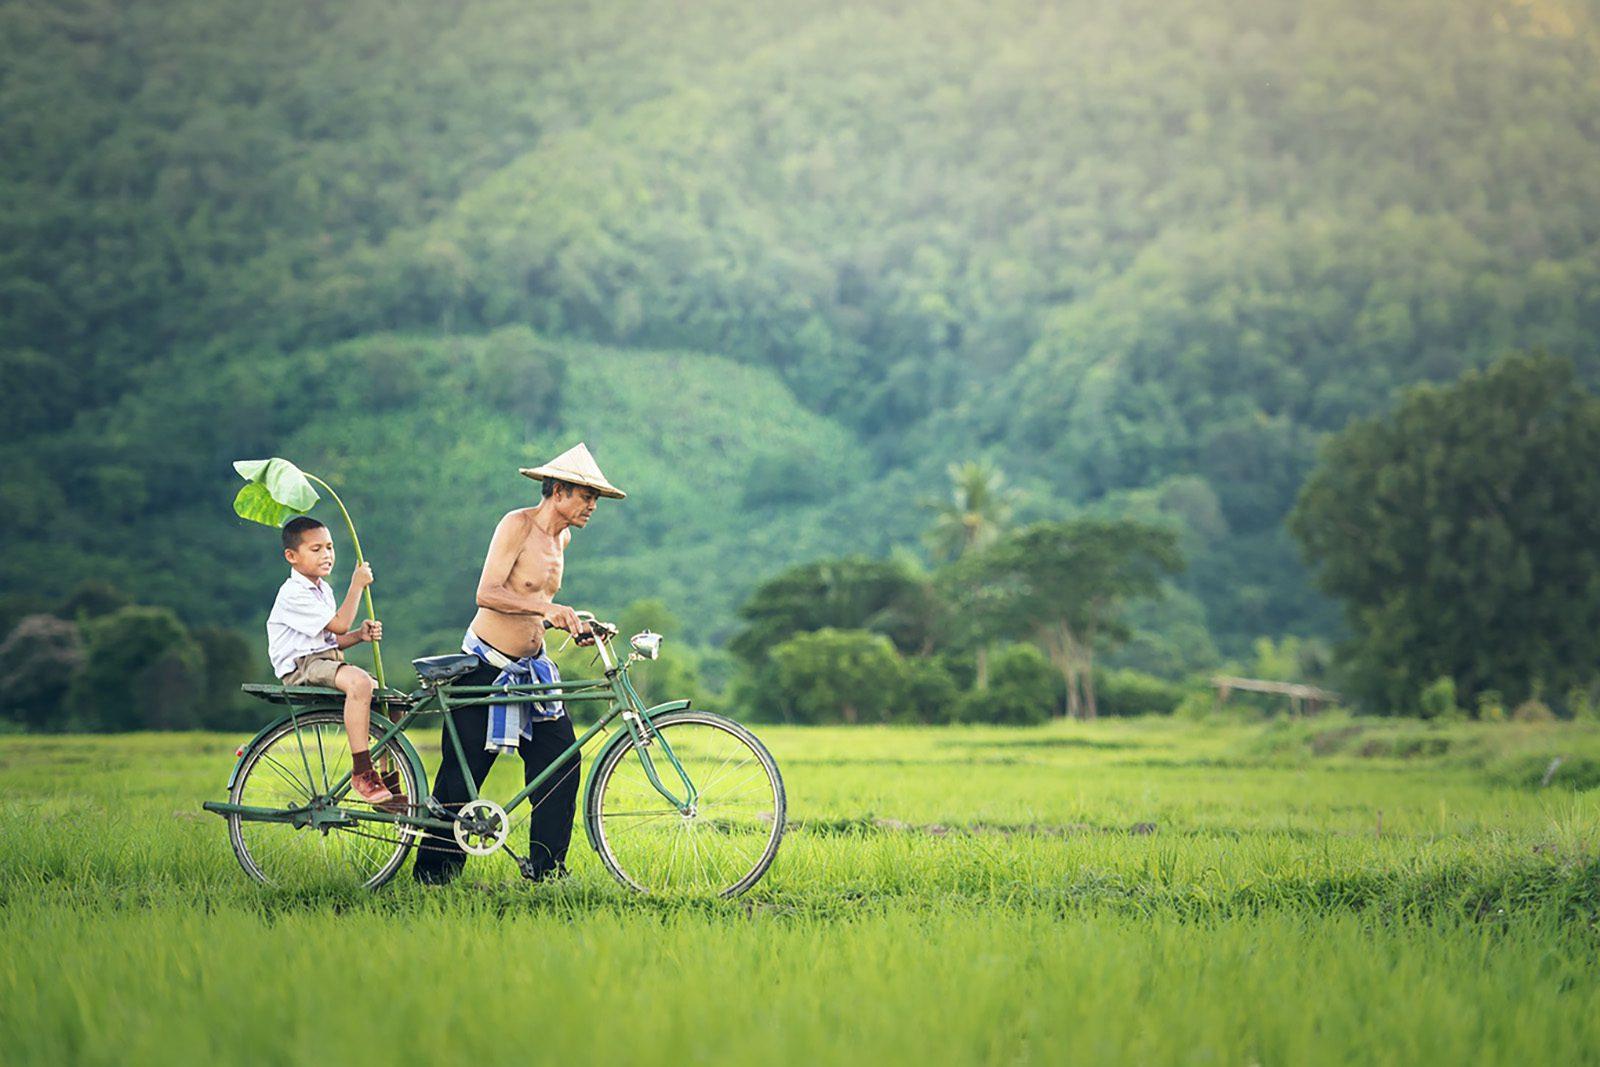 Papa et son fils dans la campagne cambodgienne, Cambodge